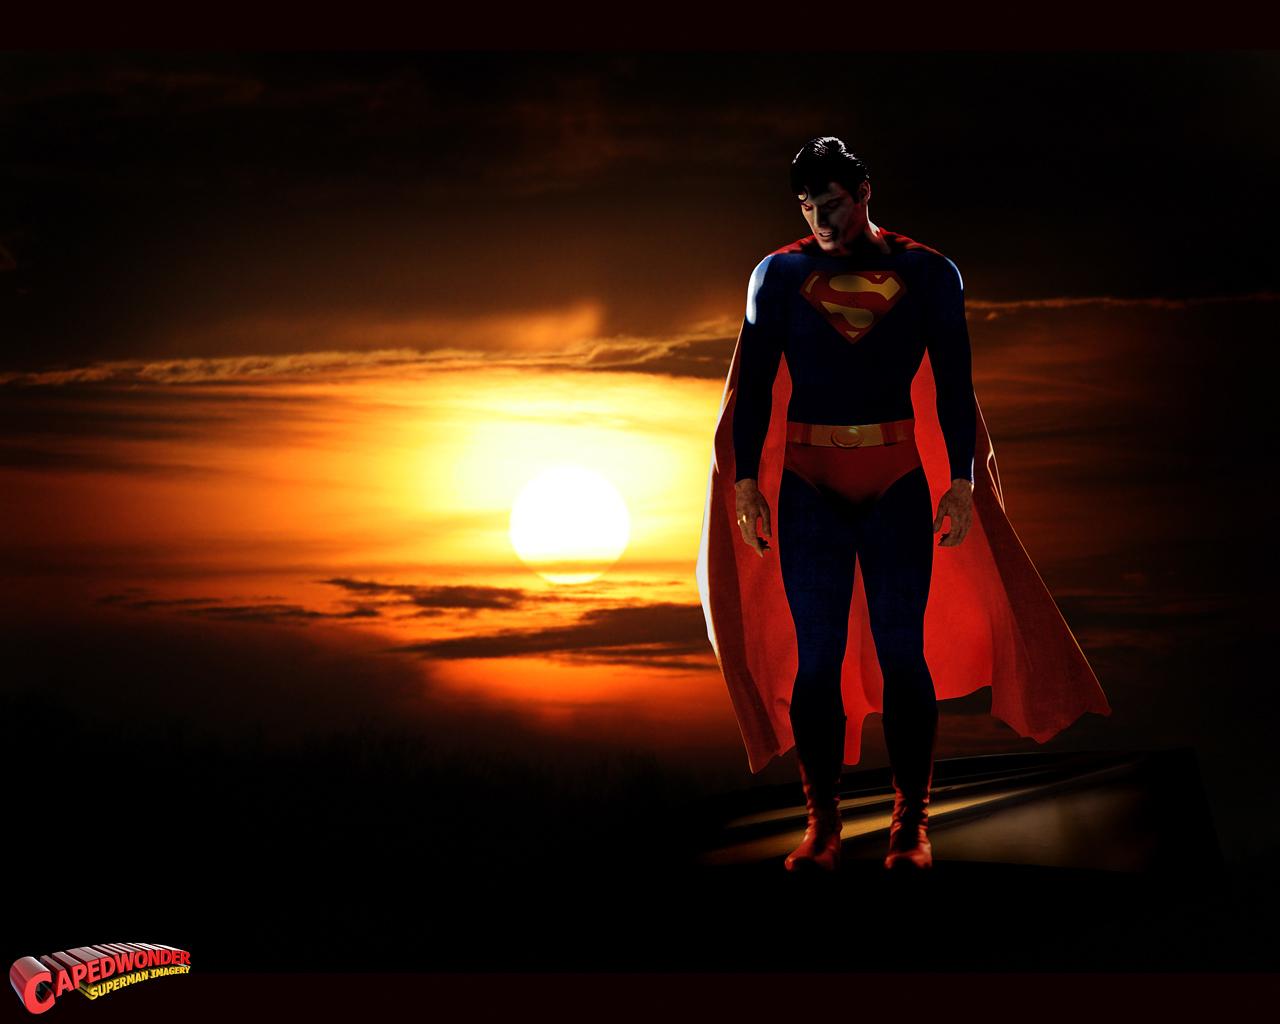 35 Amazing Superhero Wallpapers To Enhance Your Desktop SkyTechGeek 1280x1024